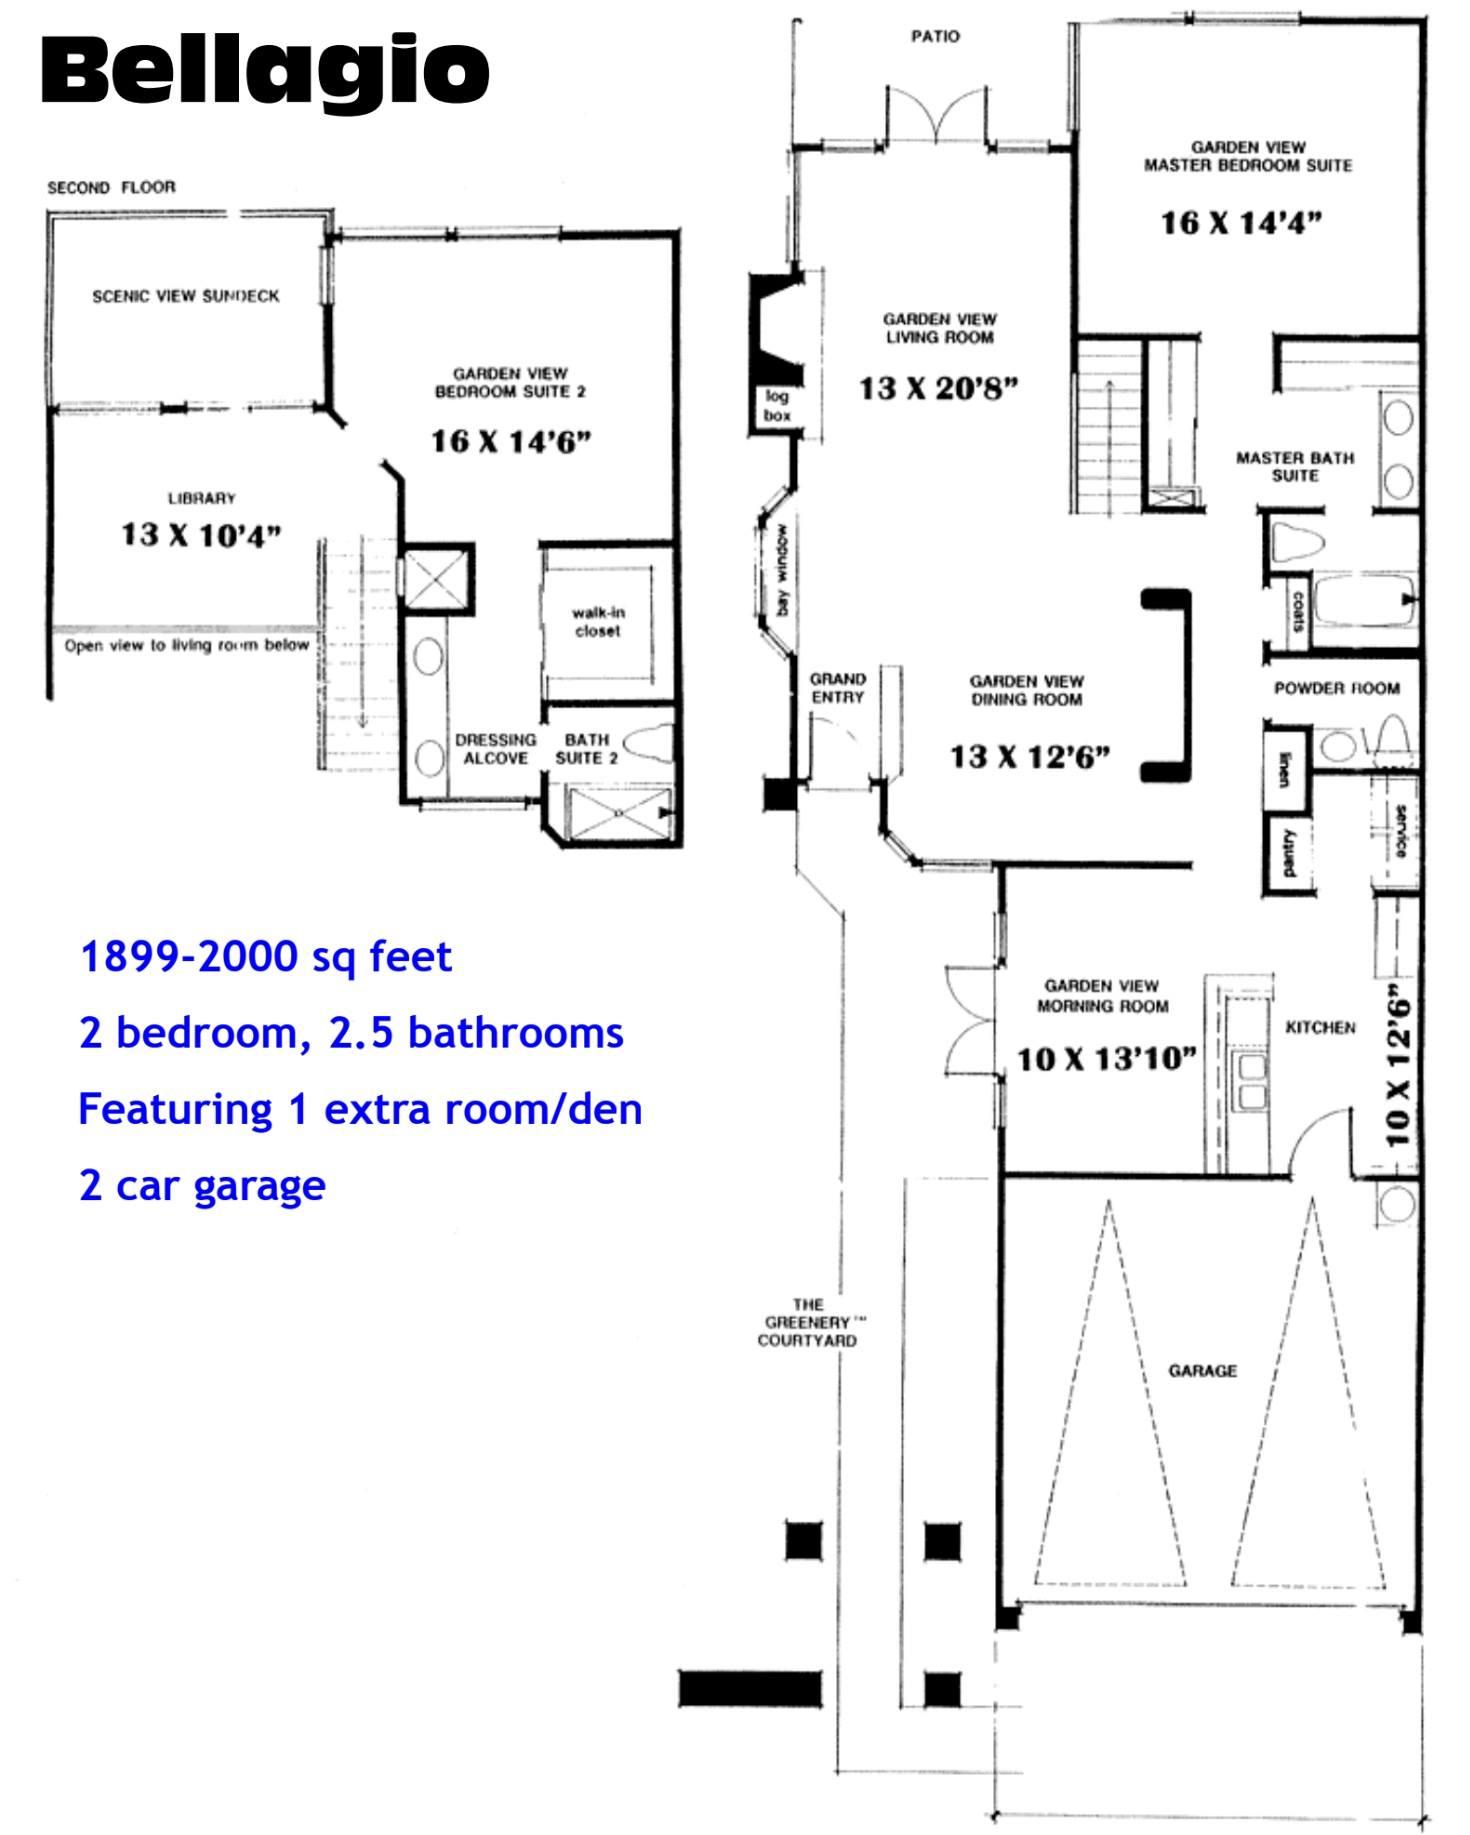 Ocean Hills Country Club Bellagio Floor Plans Ocean Hills